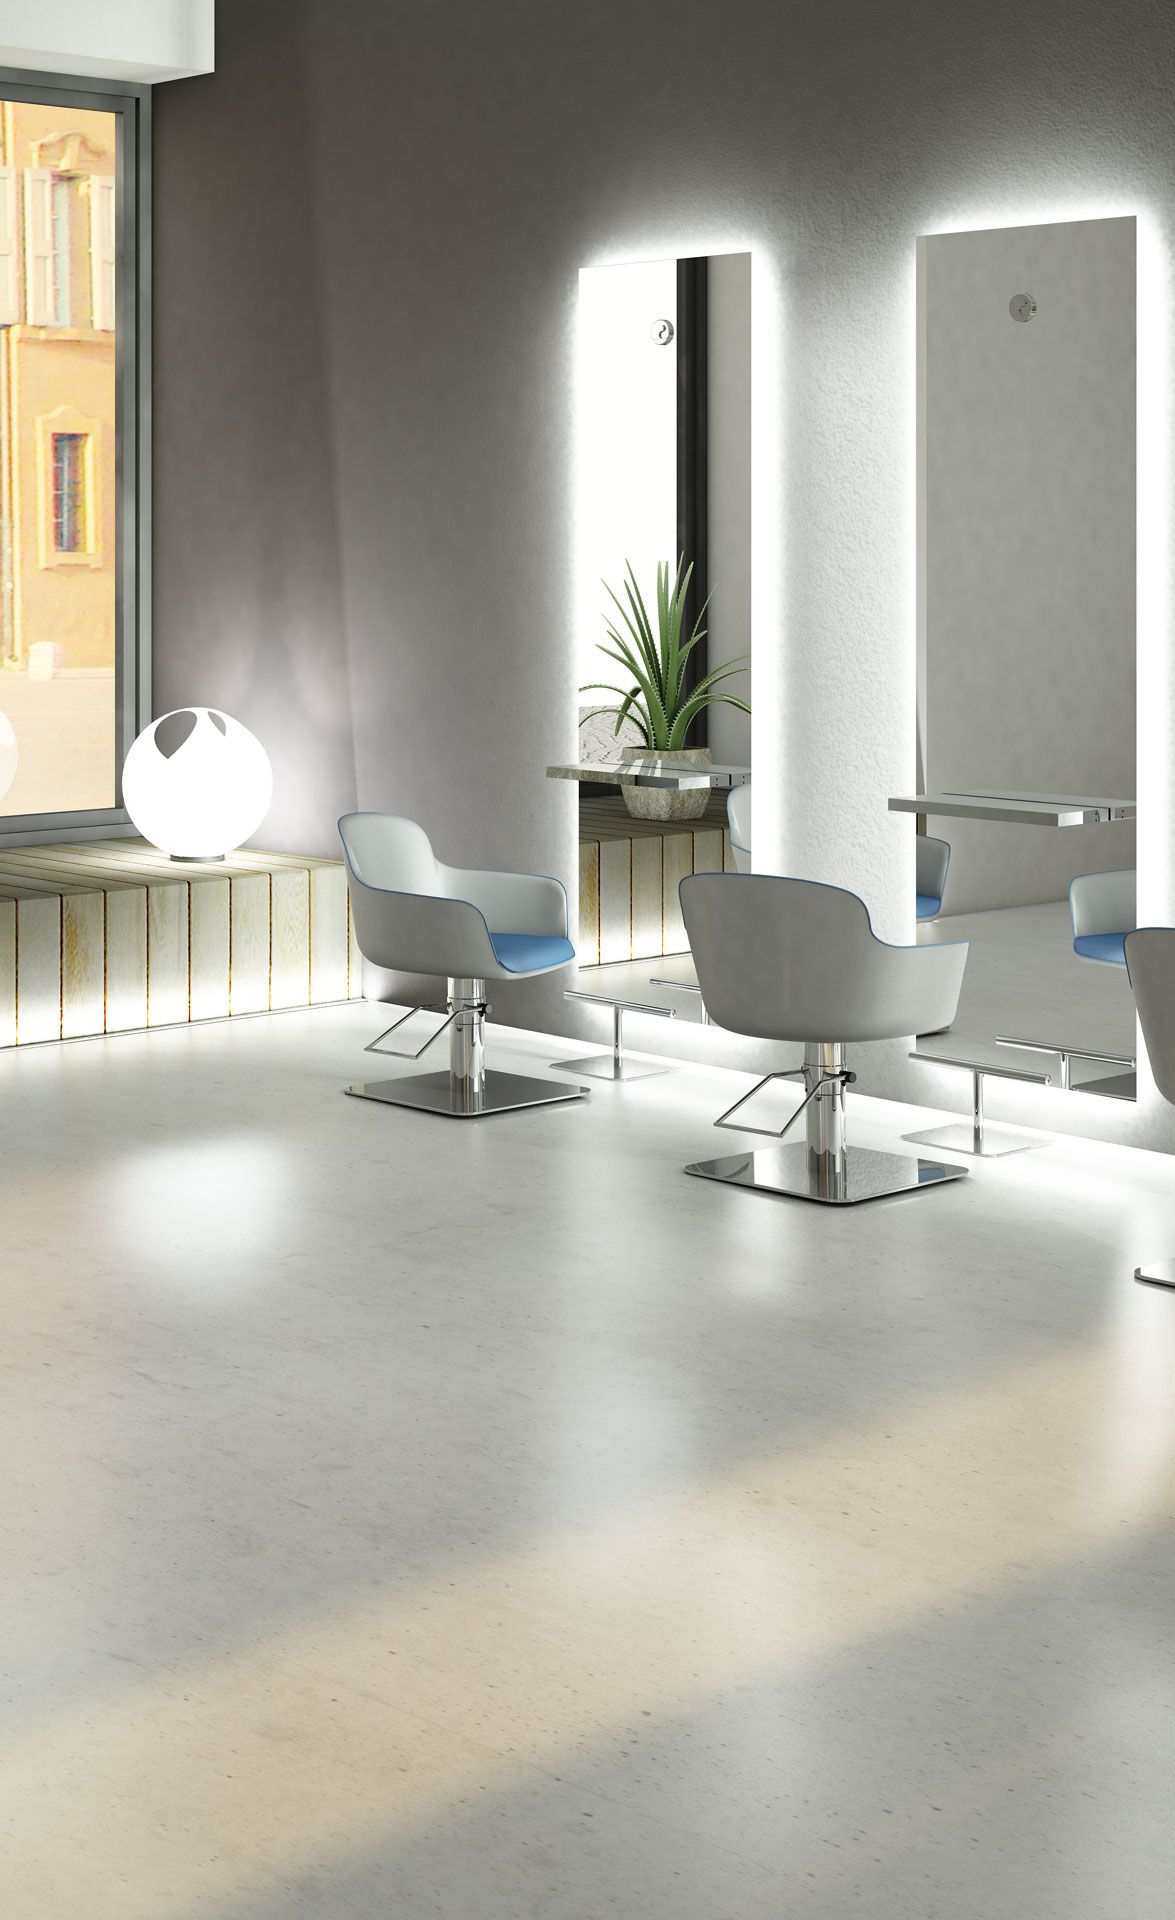 Minimal And Full Of Charm Amy Styling Chair Veil Styling Unit Area Footrest Http Www Pietranera Co Salon Suites Decor Beauty Salon Decor Hair Salon Decor